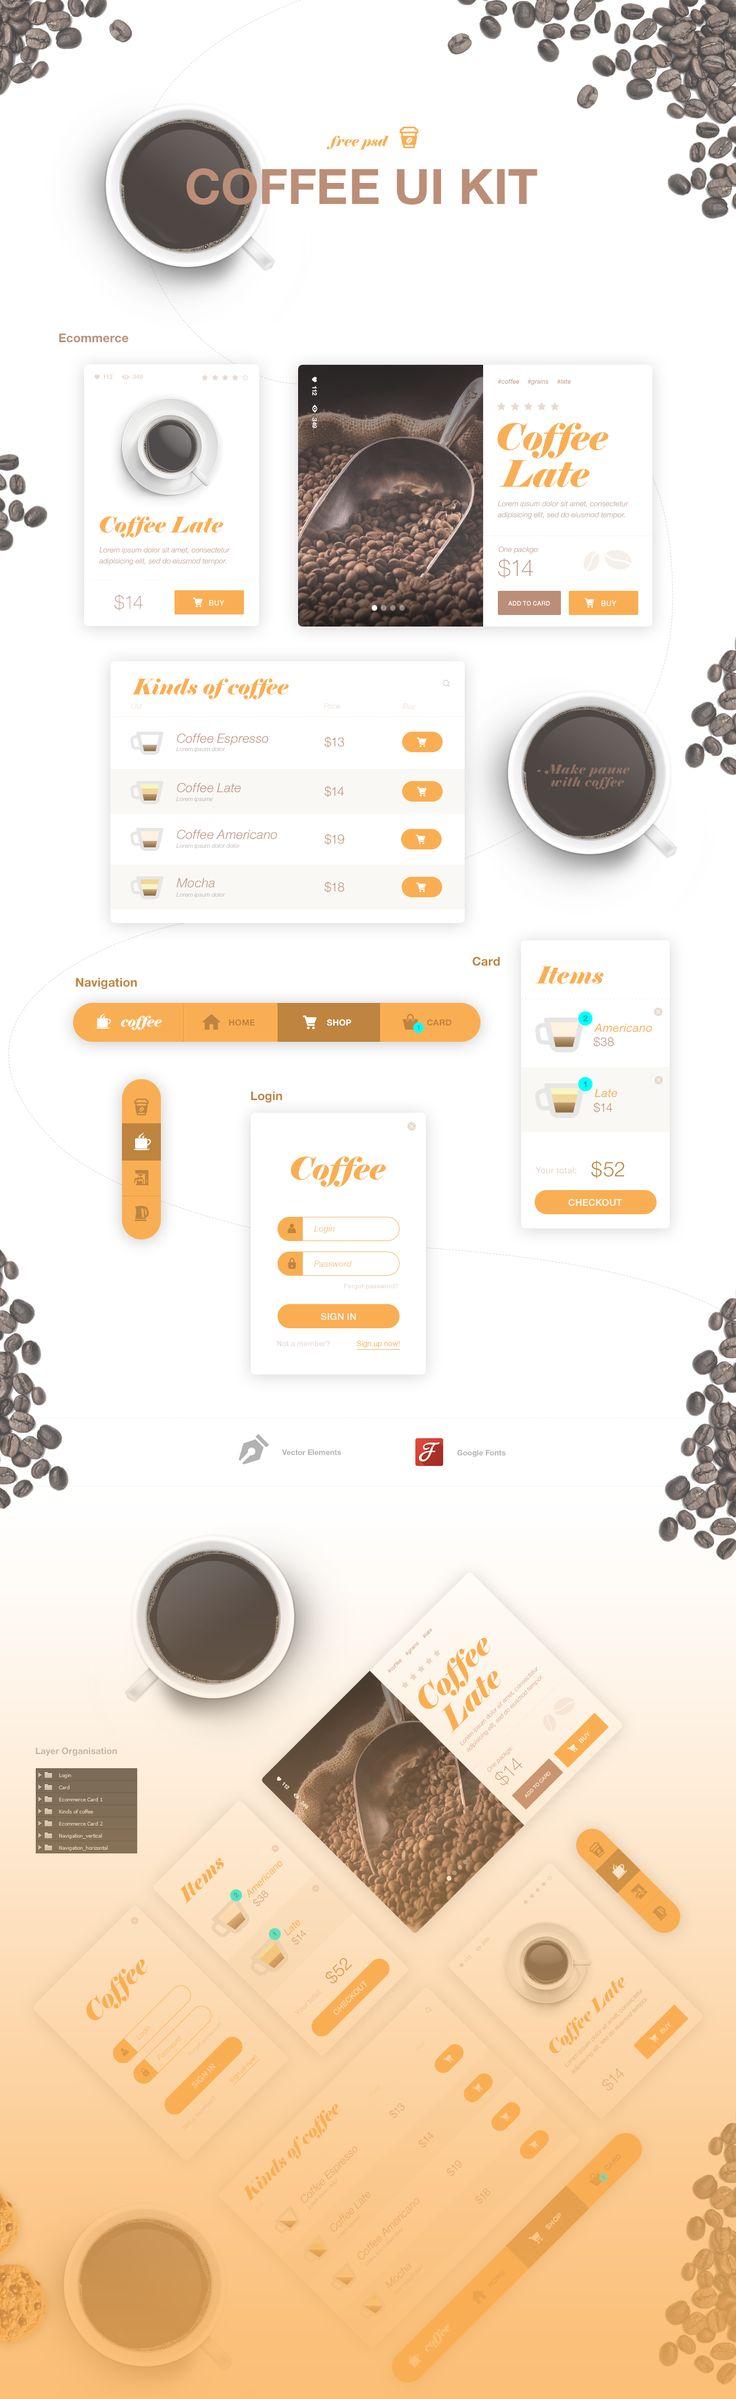 Coffee UI Kit - Free Psd on Behance